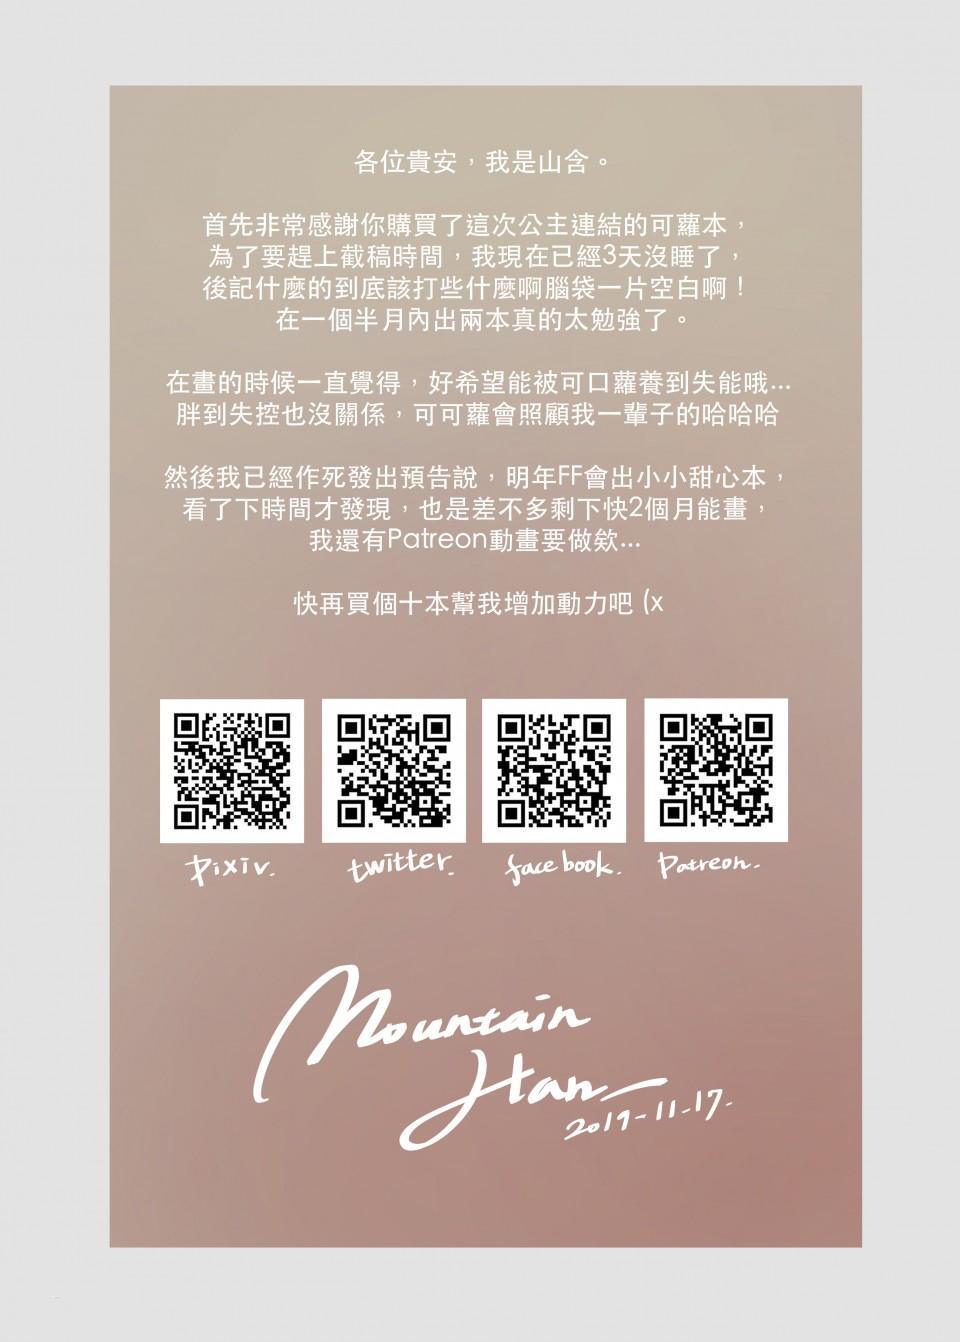 [MountainHan(山含)] 真拿主人沒辦法❤️  (Princess Connect! Re:Dive) [Chinese] [切嚕系女子個人搬運] [Decensored]+公主連結only場次限定本宣傳 32